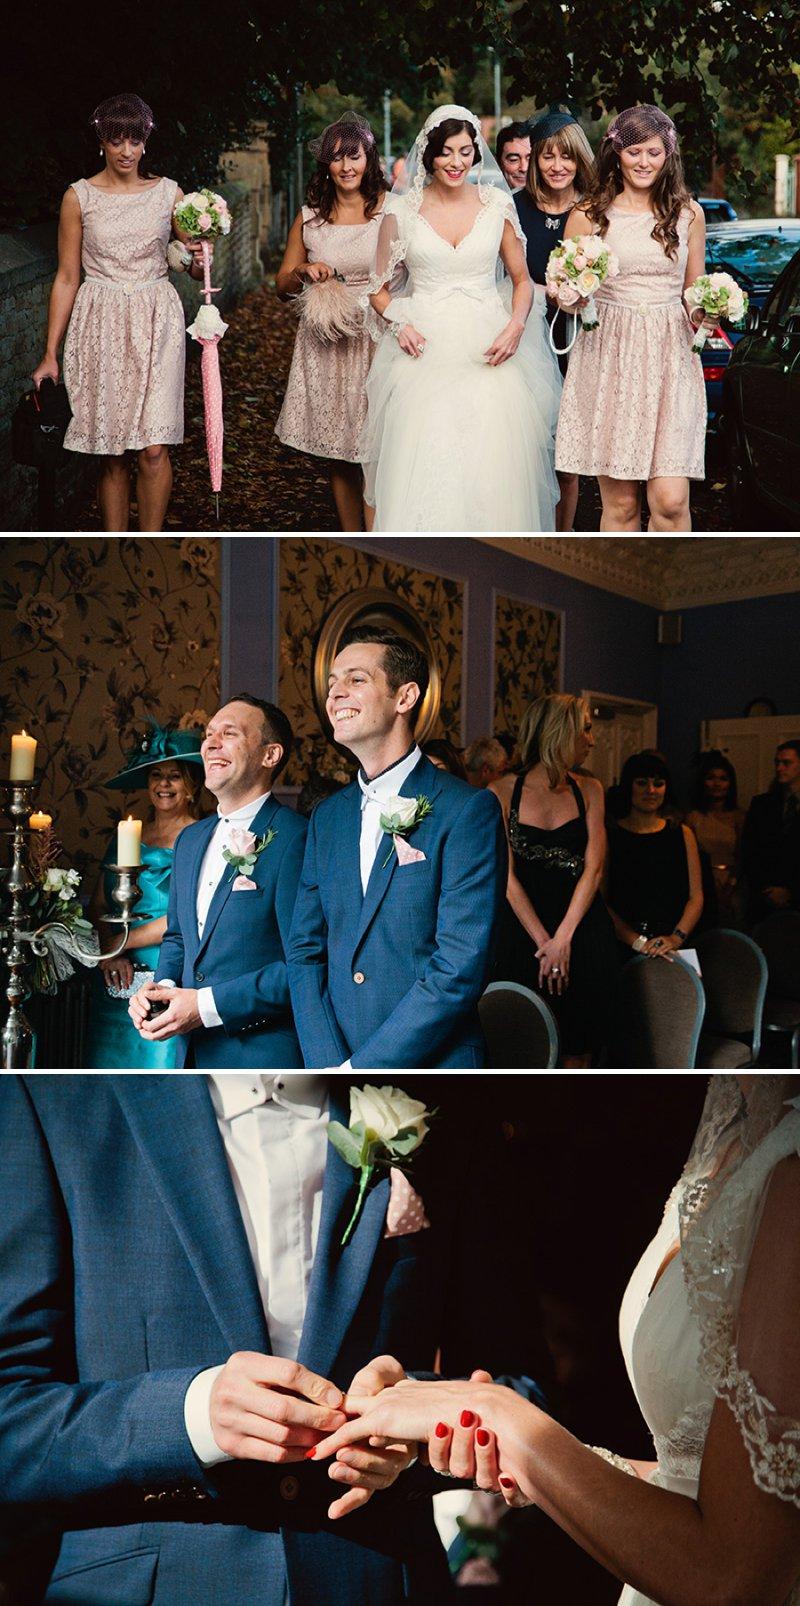 Lusan Mandongus Bridal Gown Peach Pink Bridesmaid Dresses